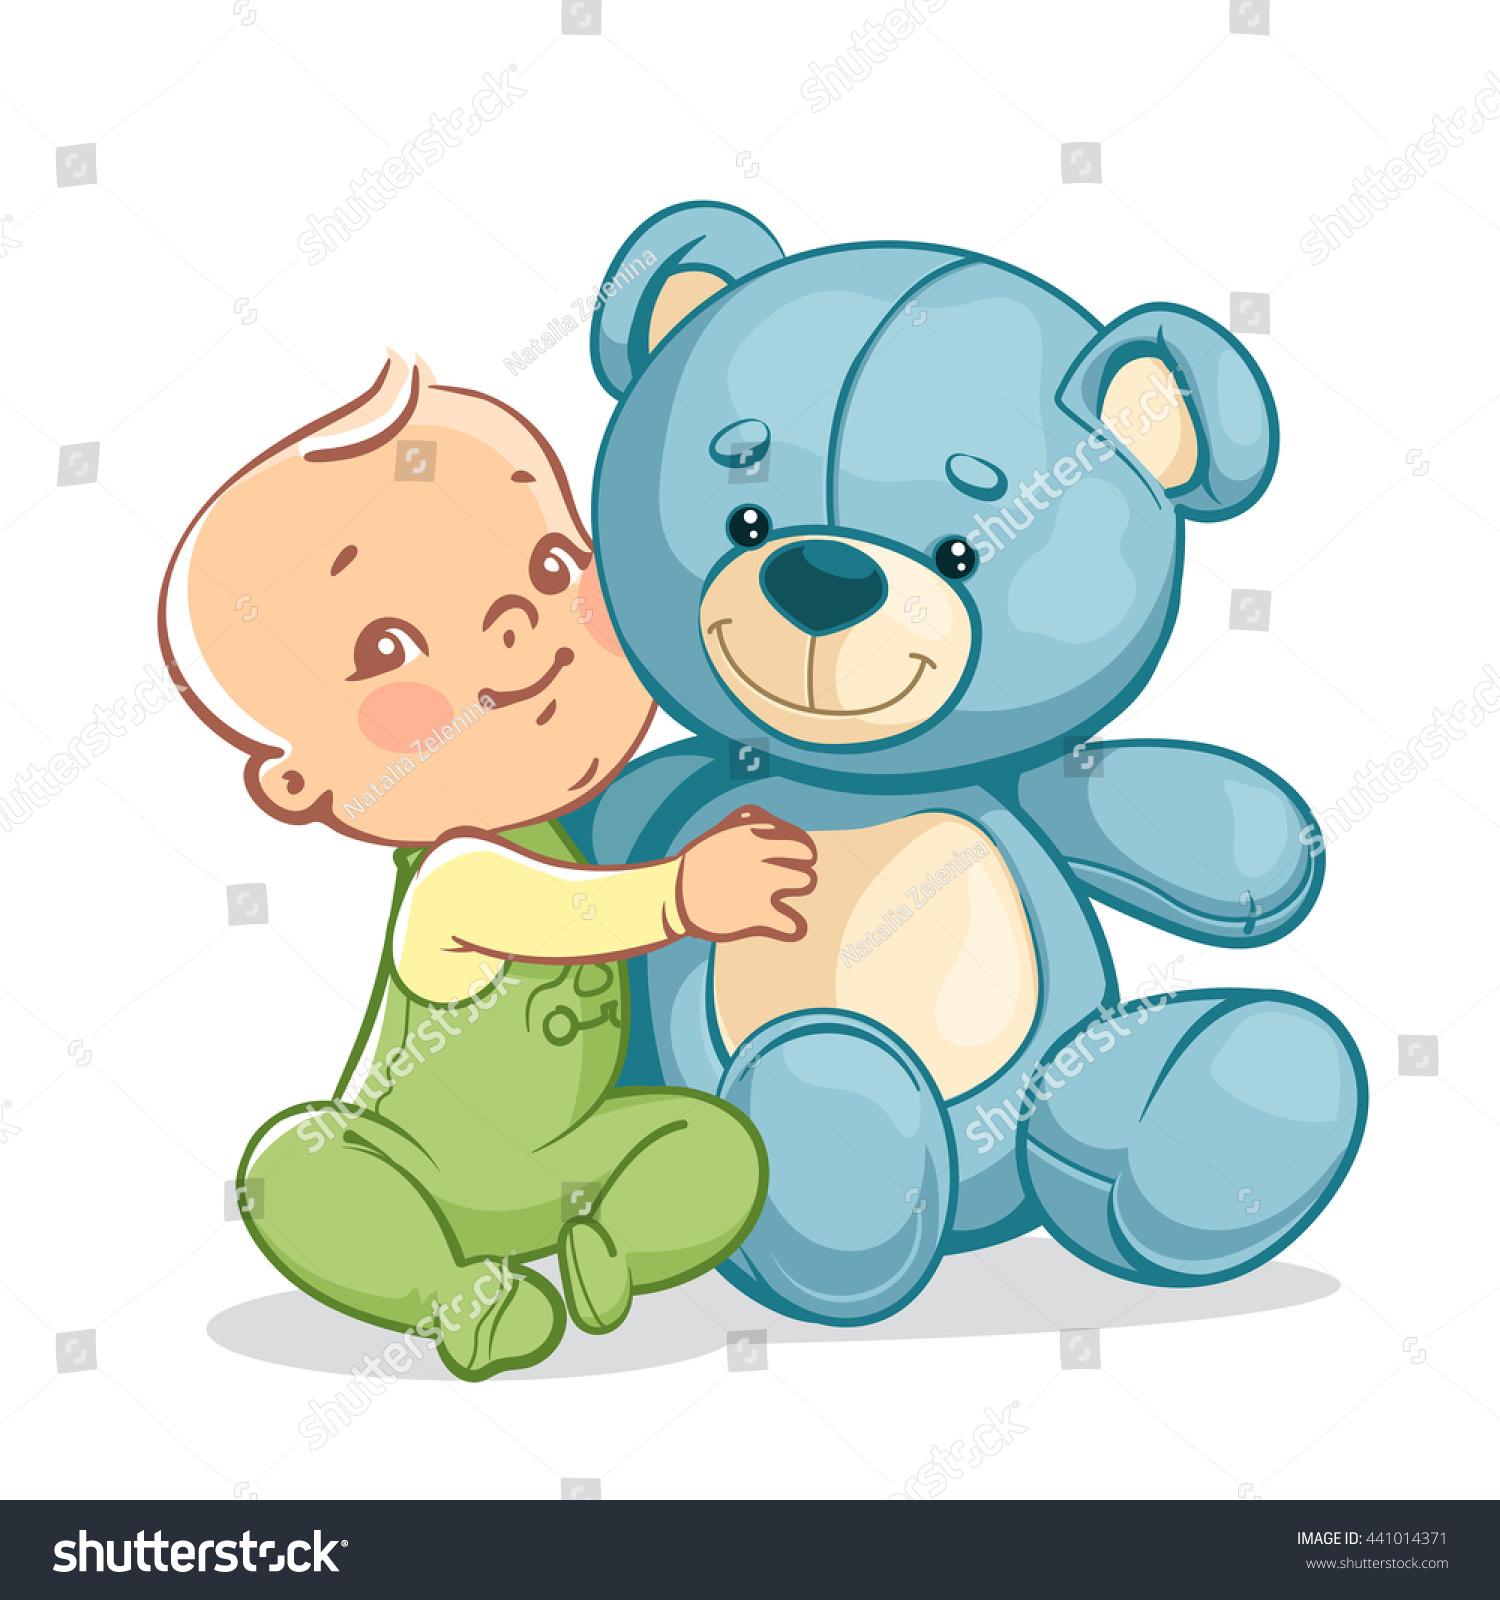 Little Baby Boy Big Toy e Stock Vector Shutterstock